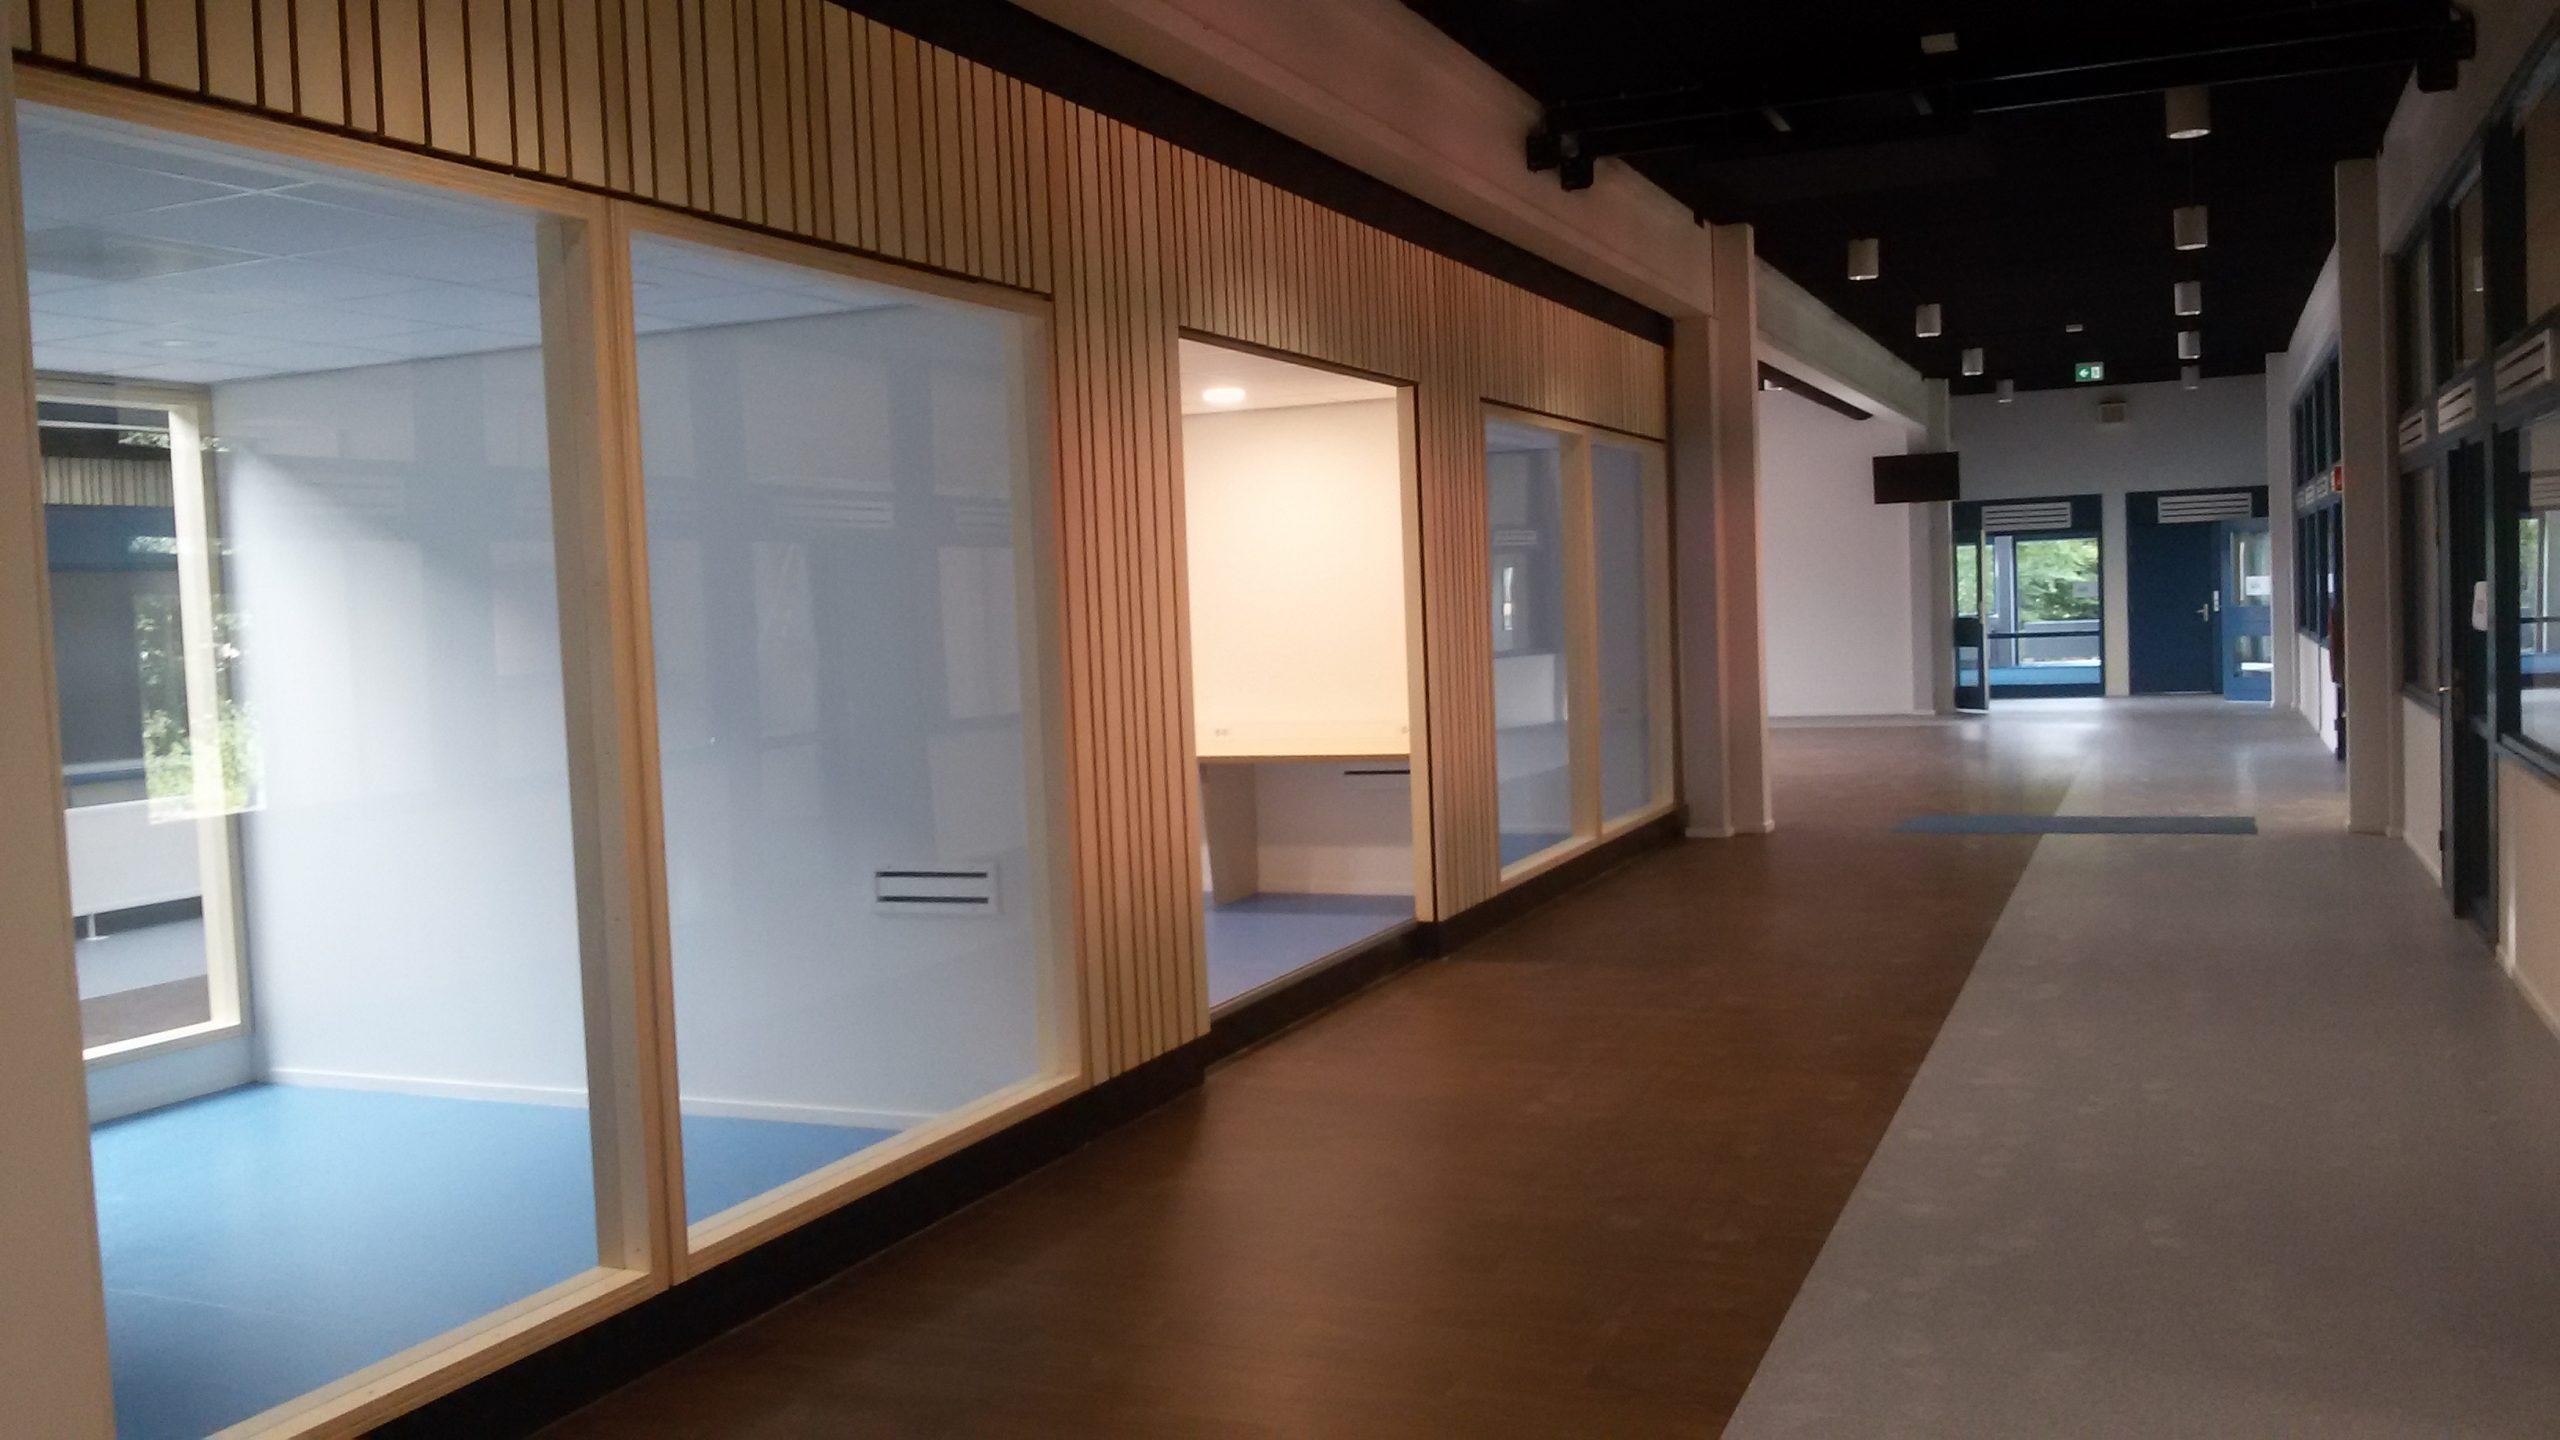 Almere College Dronten gallery